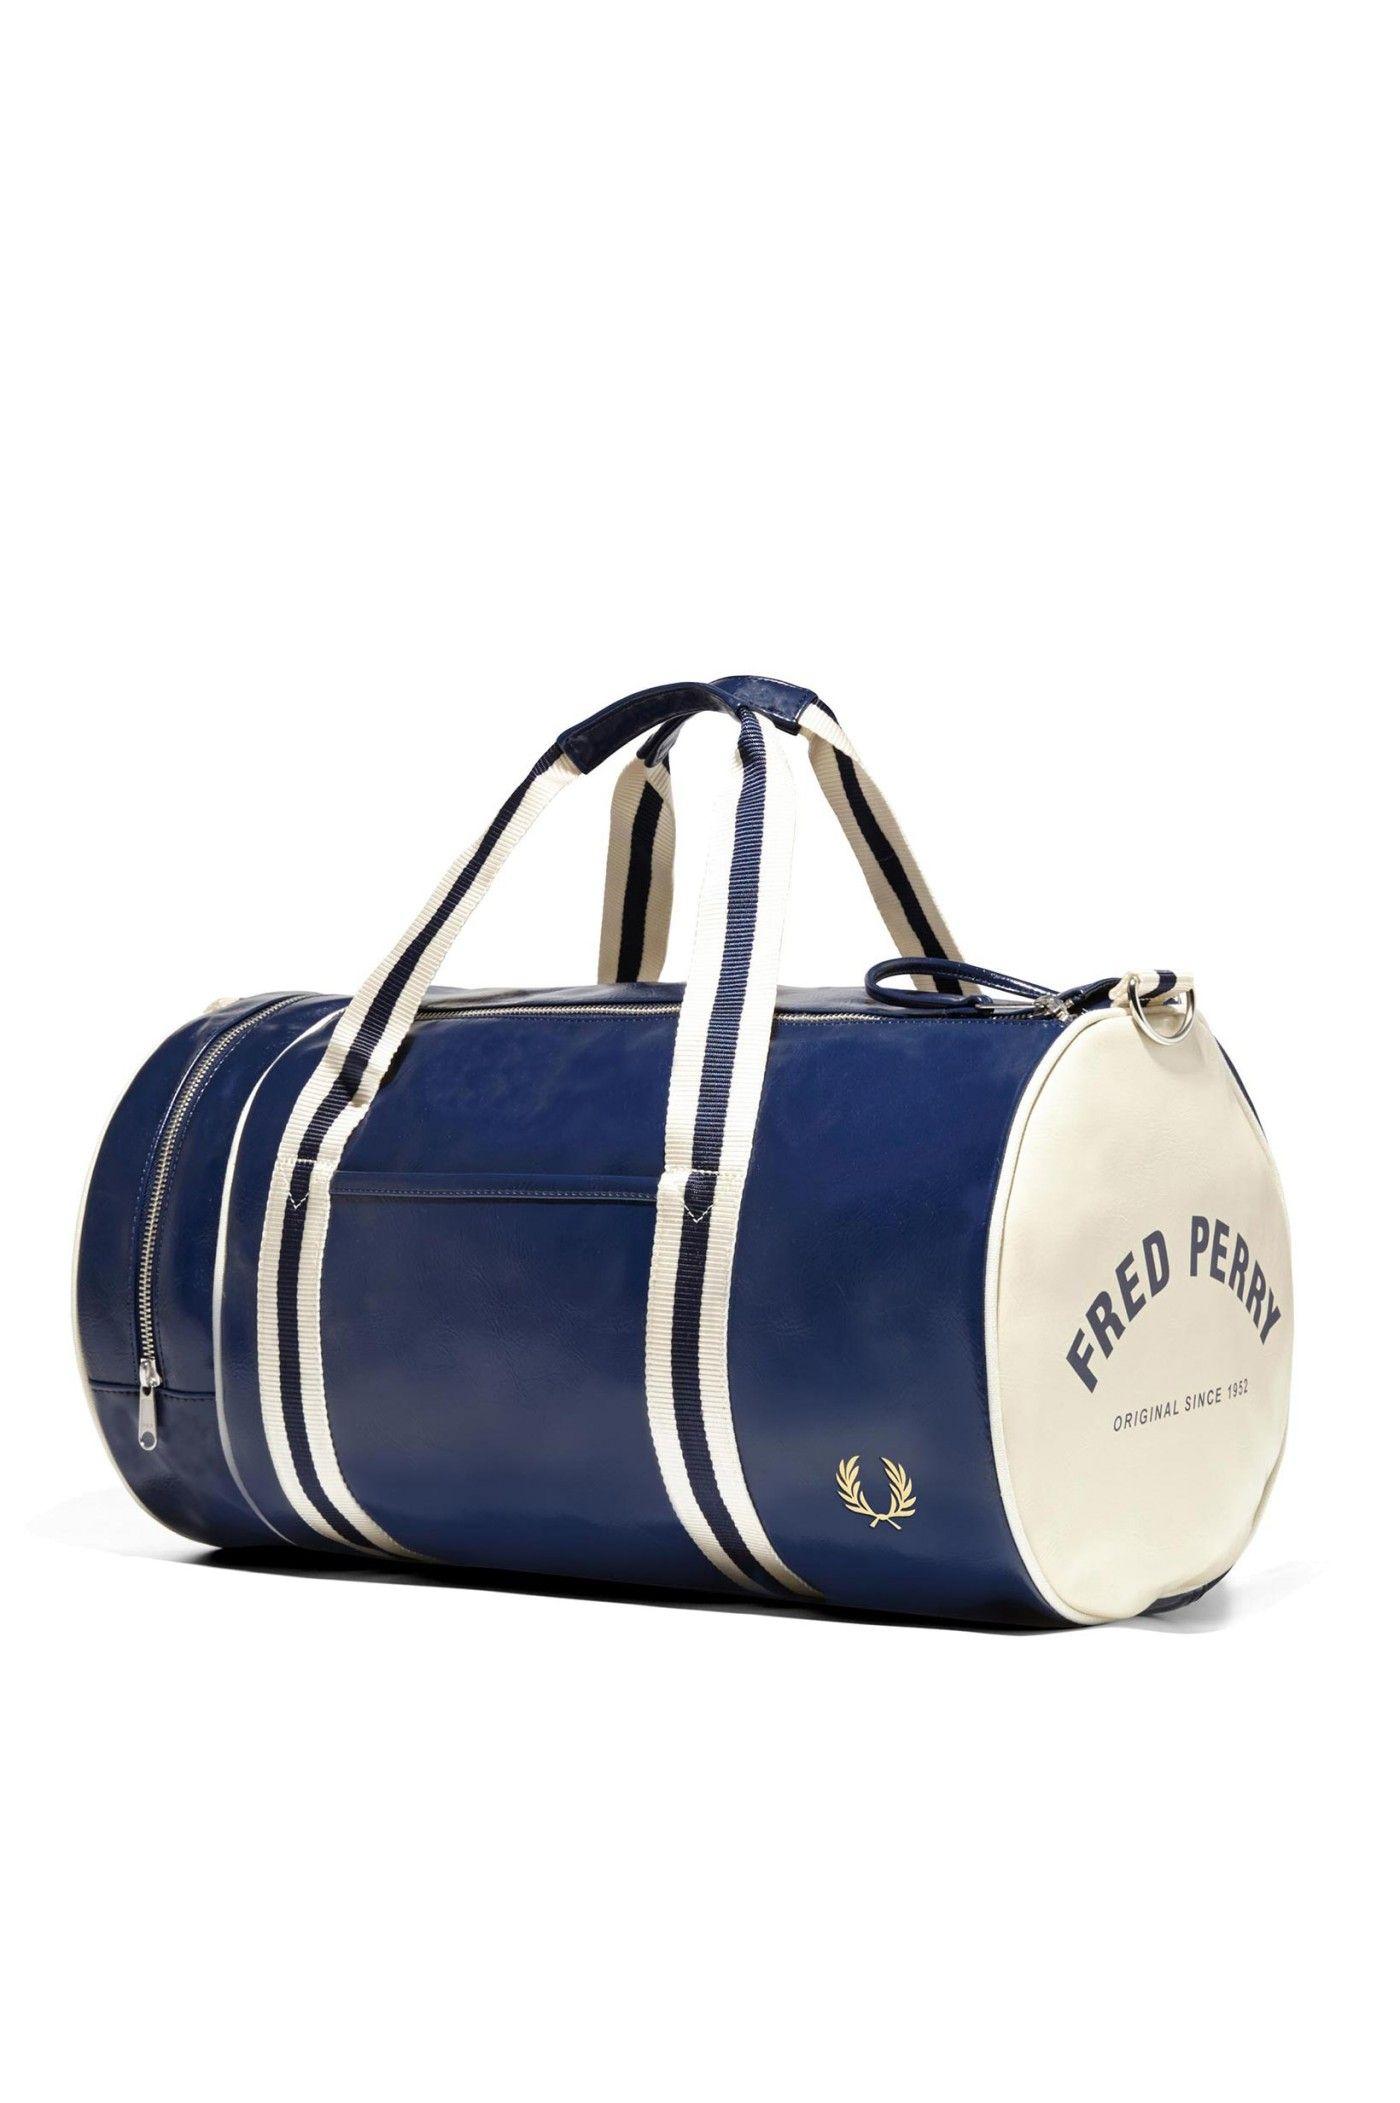 Fred Perry - Classic Barrel Bag Navy   Ecru  a958befa50a52